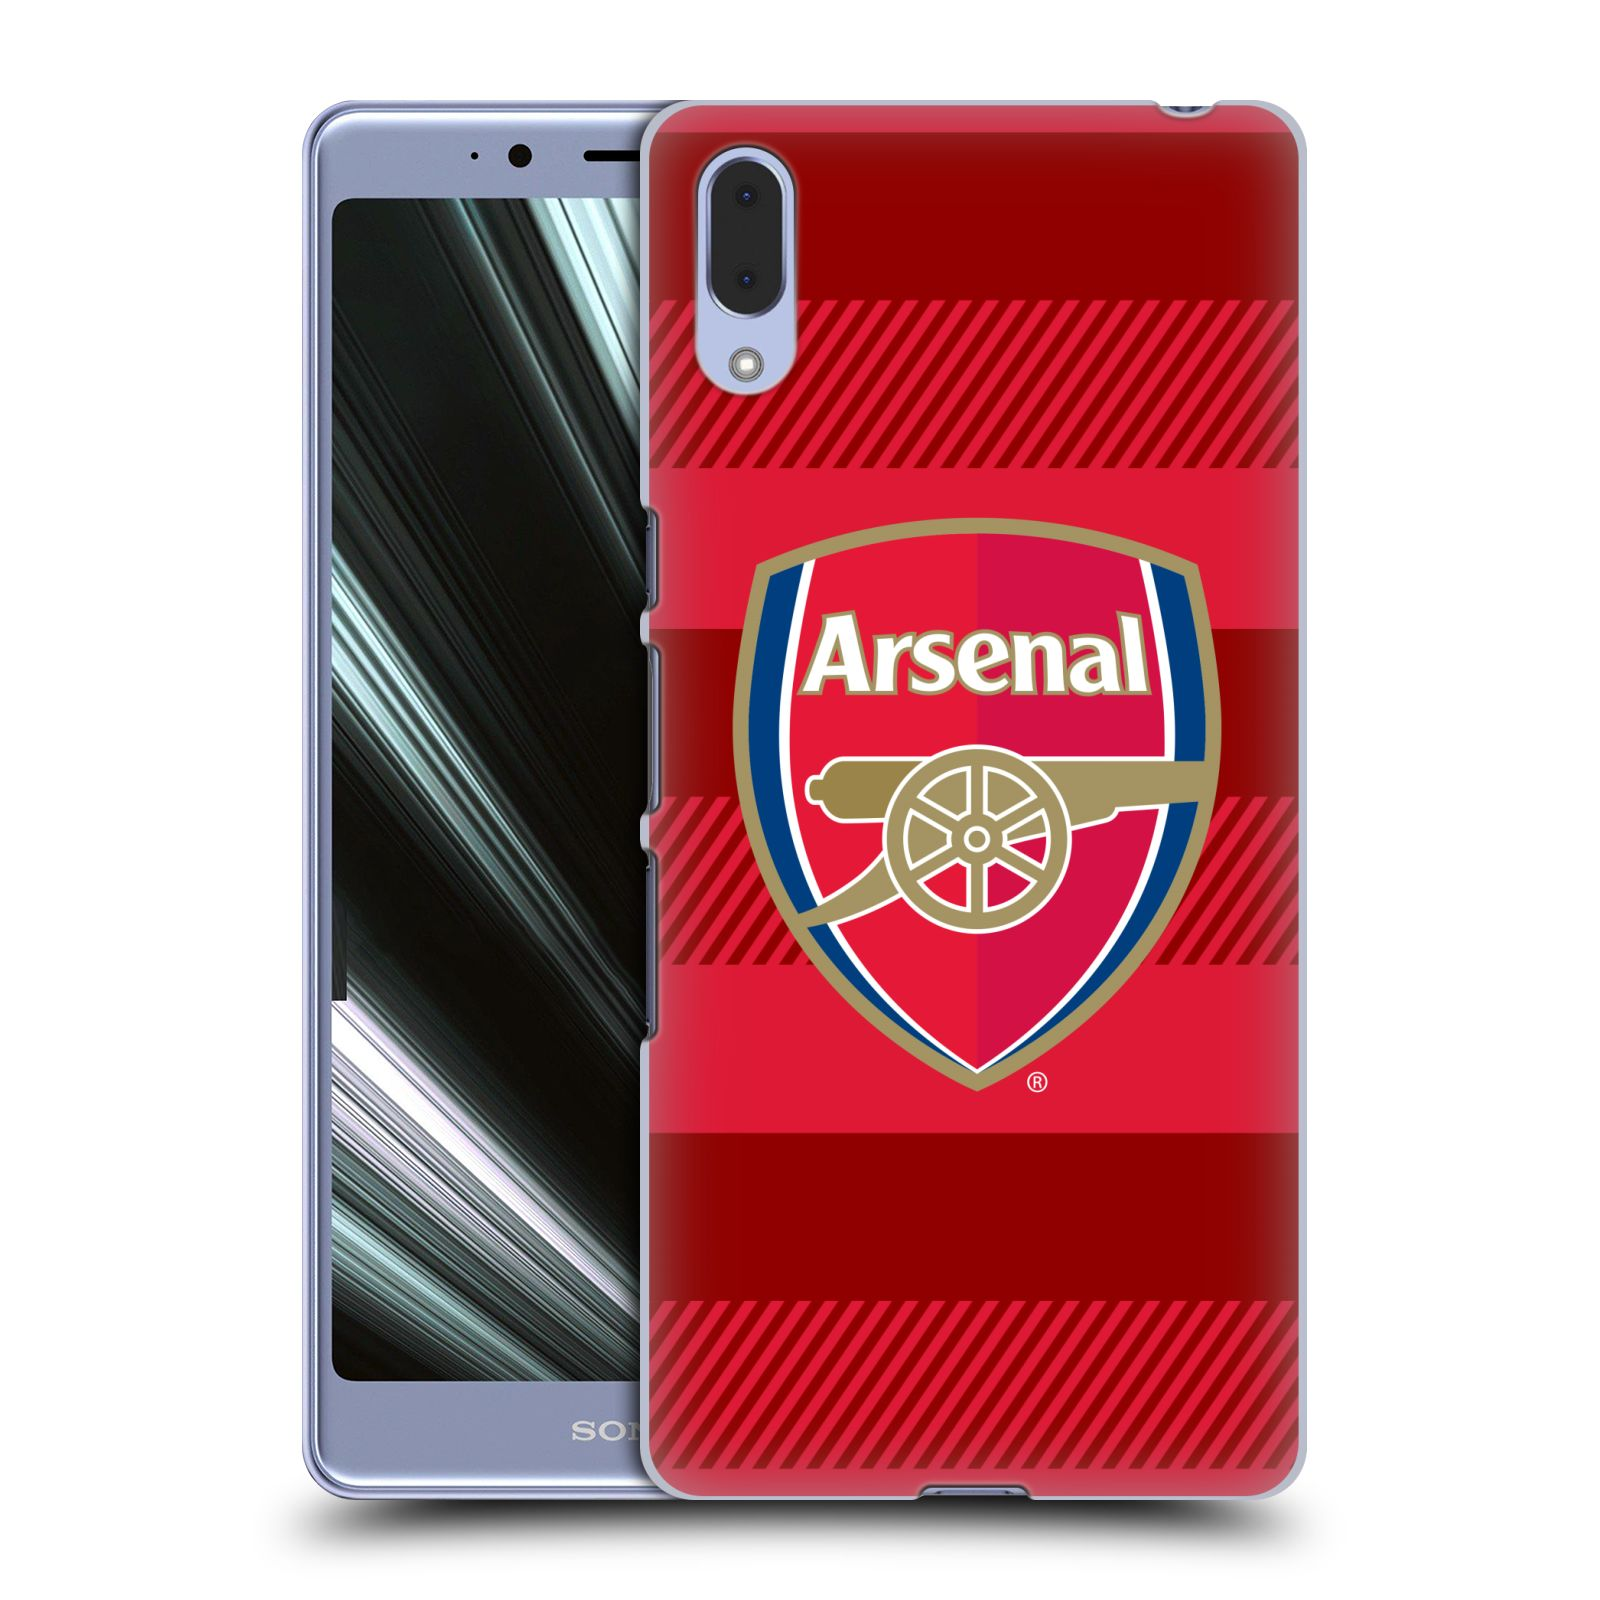 Plastové pouzdro na mobil Sony Xperia L3 - Head Case - Arsenal FC - Logo s pruhy